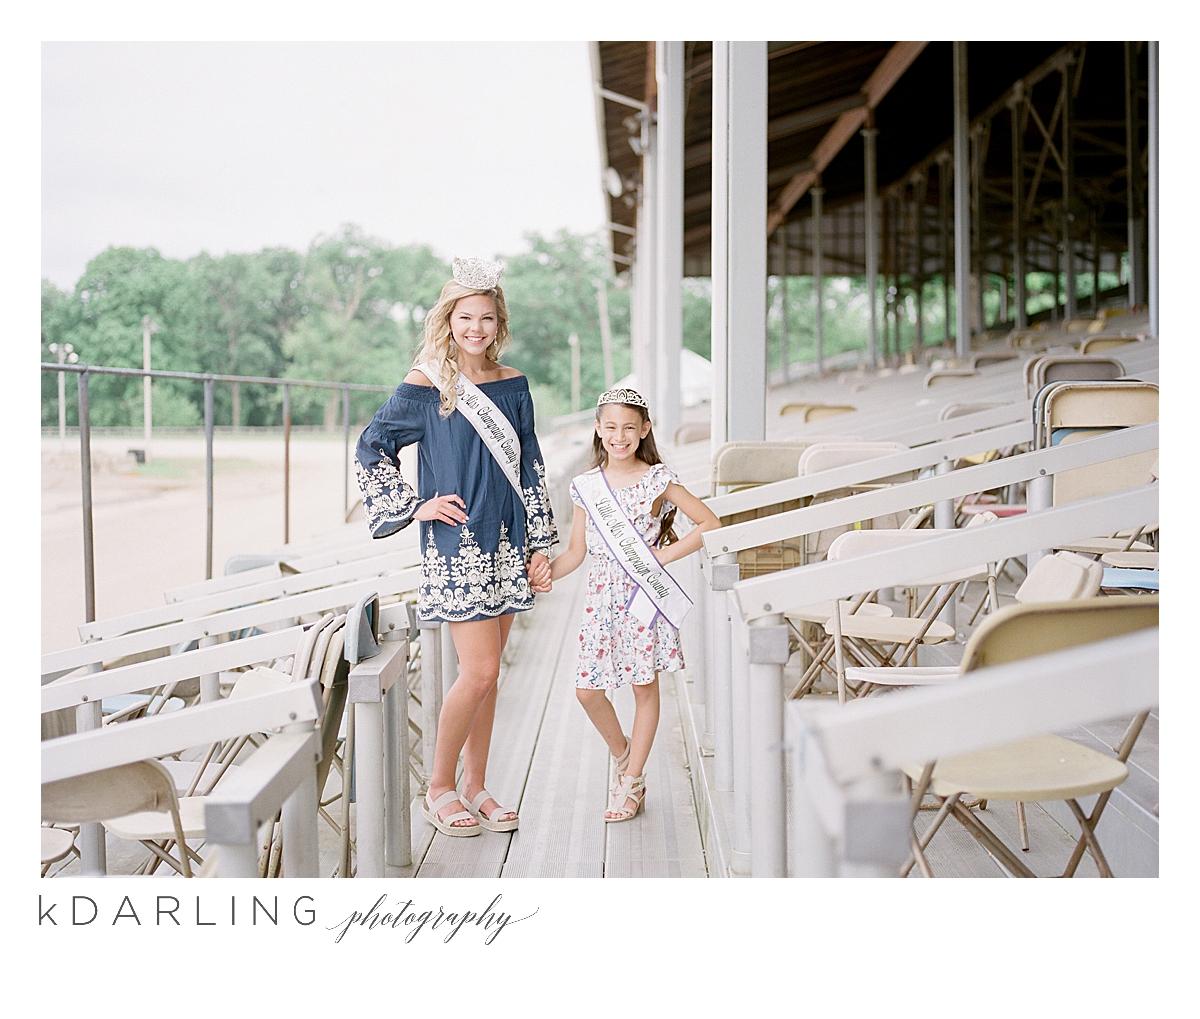 Champaign-County-Fair-in-Urbana-Queen-Pageant-Teen-Tween-Photographer-Film